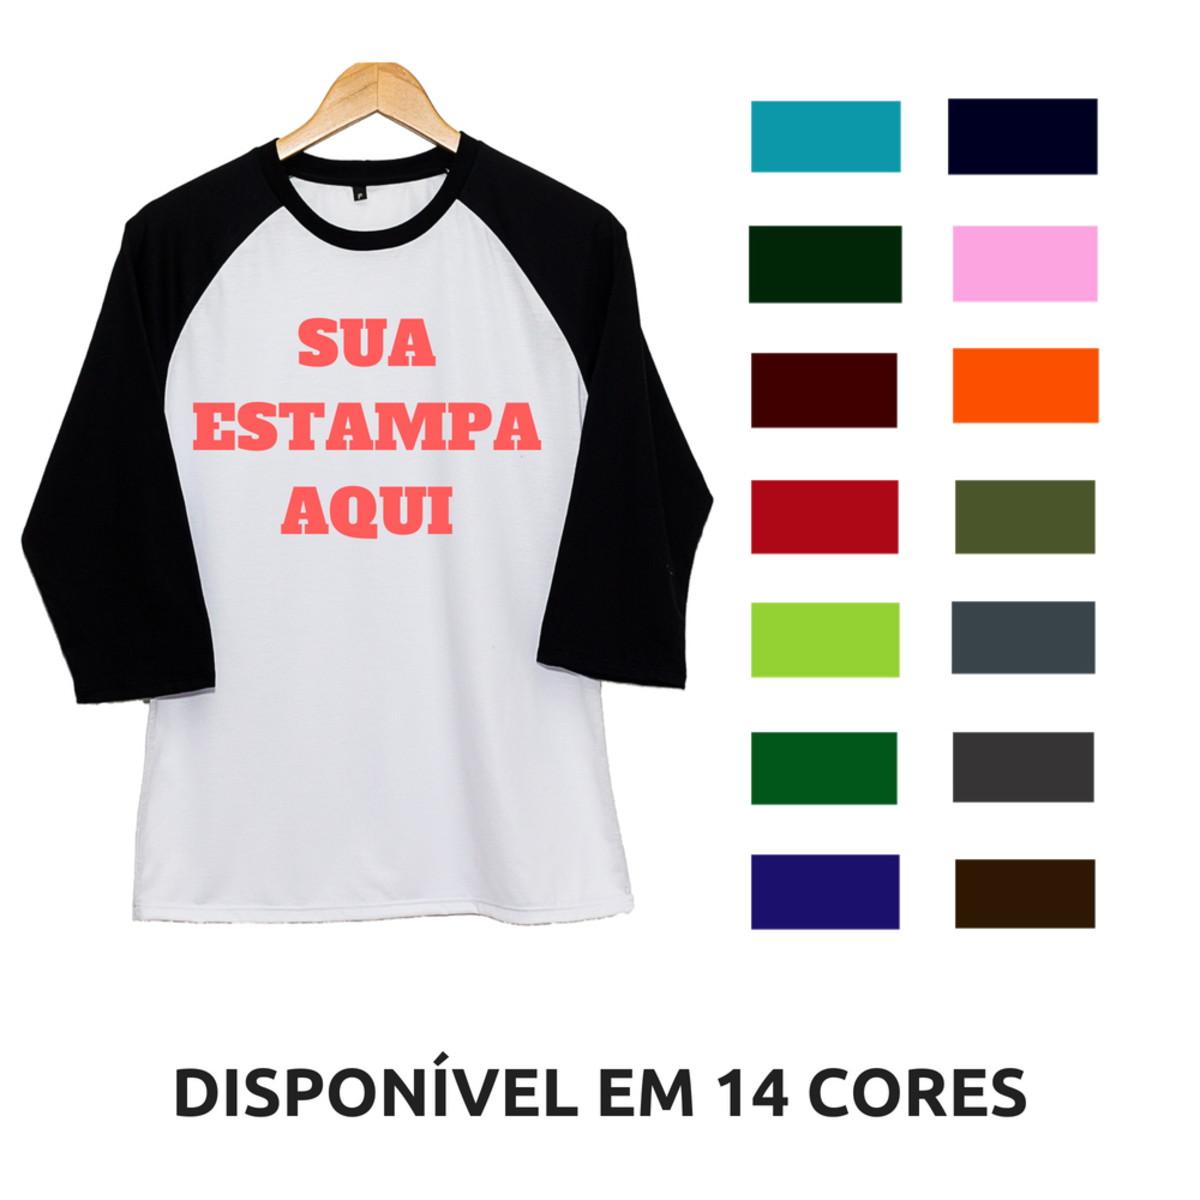 9173130bf3c Camiseta Raglan Sua Estampa Aqui Manga 3 4 Personalizada no Elo7 ...